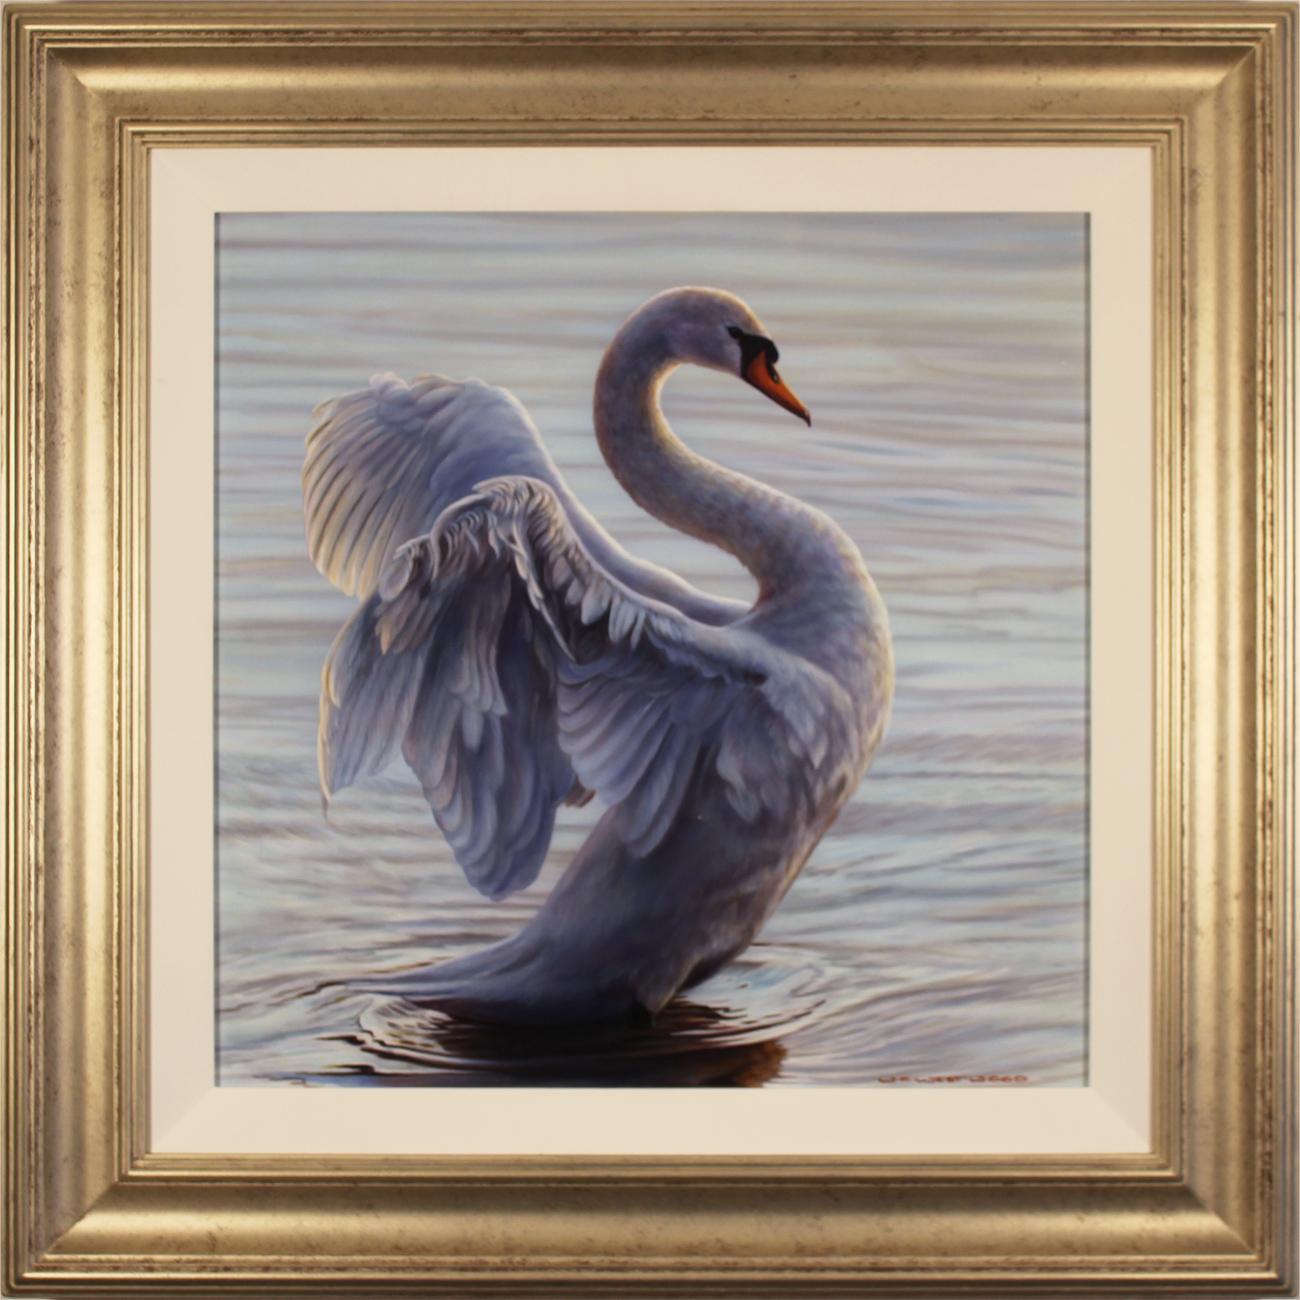 Wayne Westwood, Original oil painting on panel, White Swan, click to enlarge